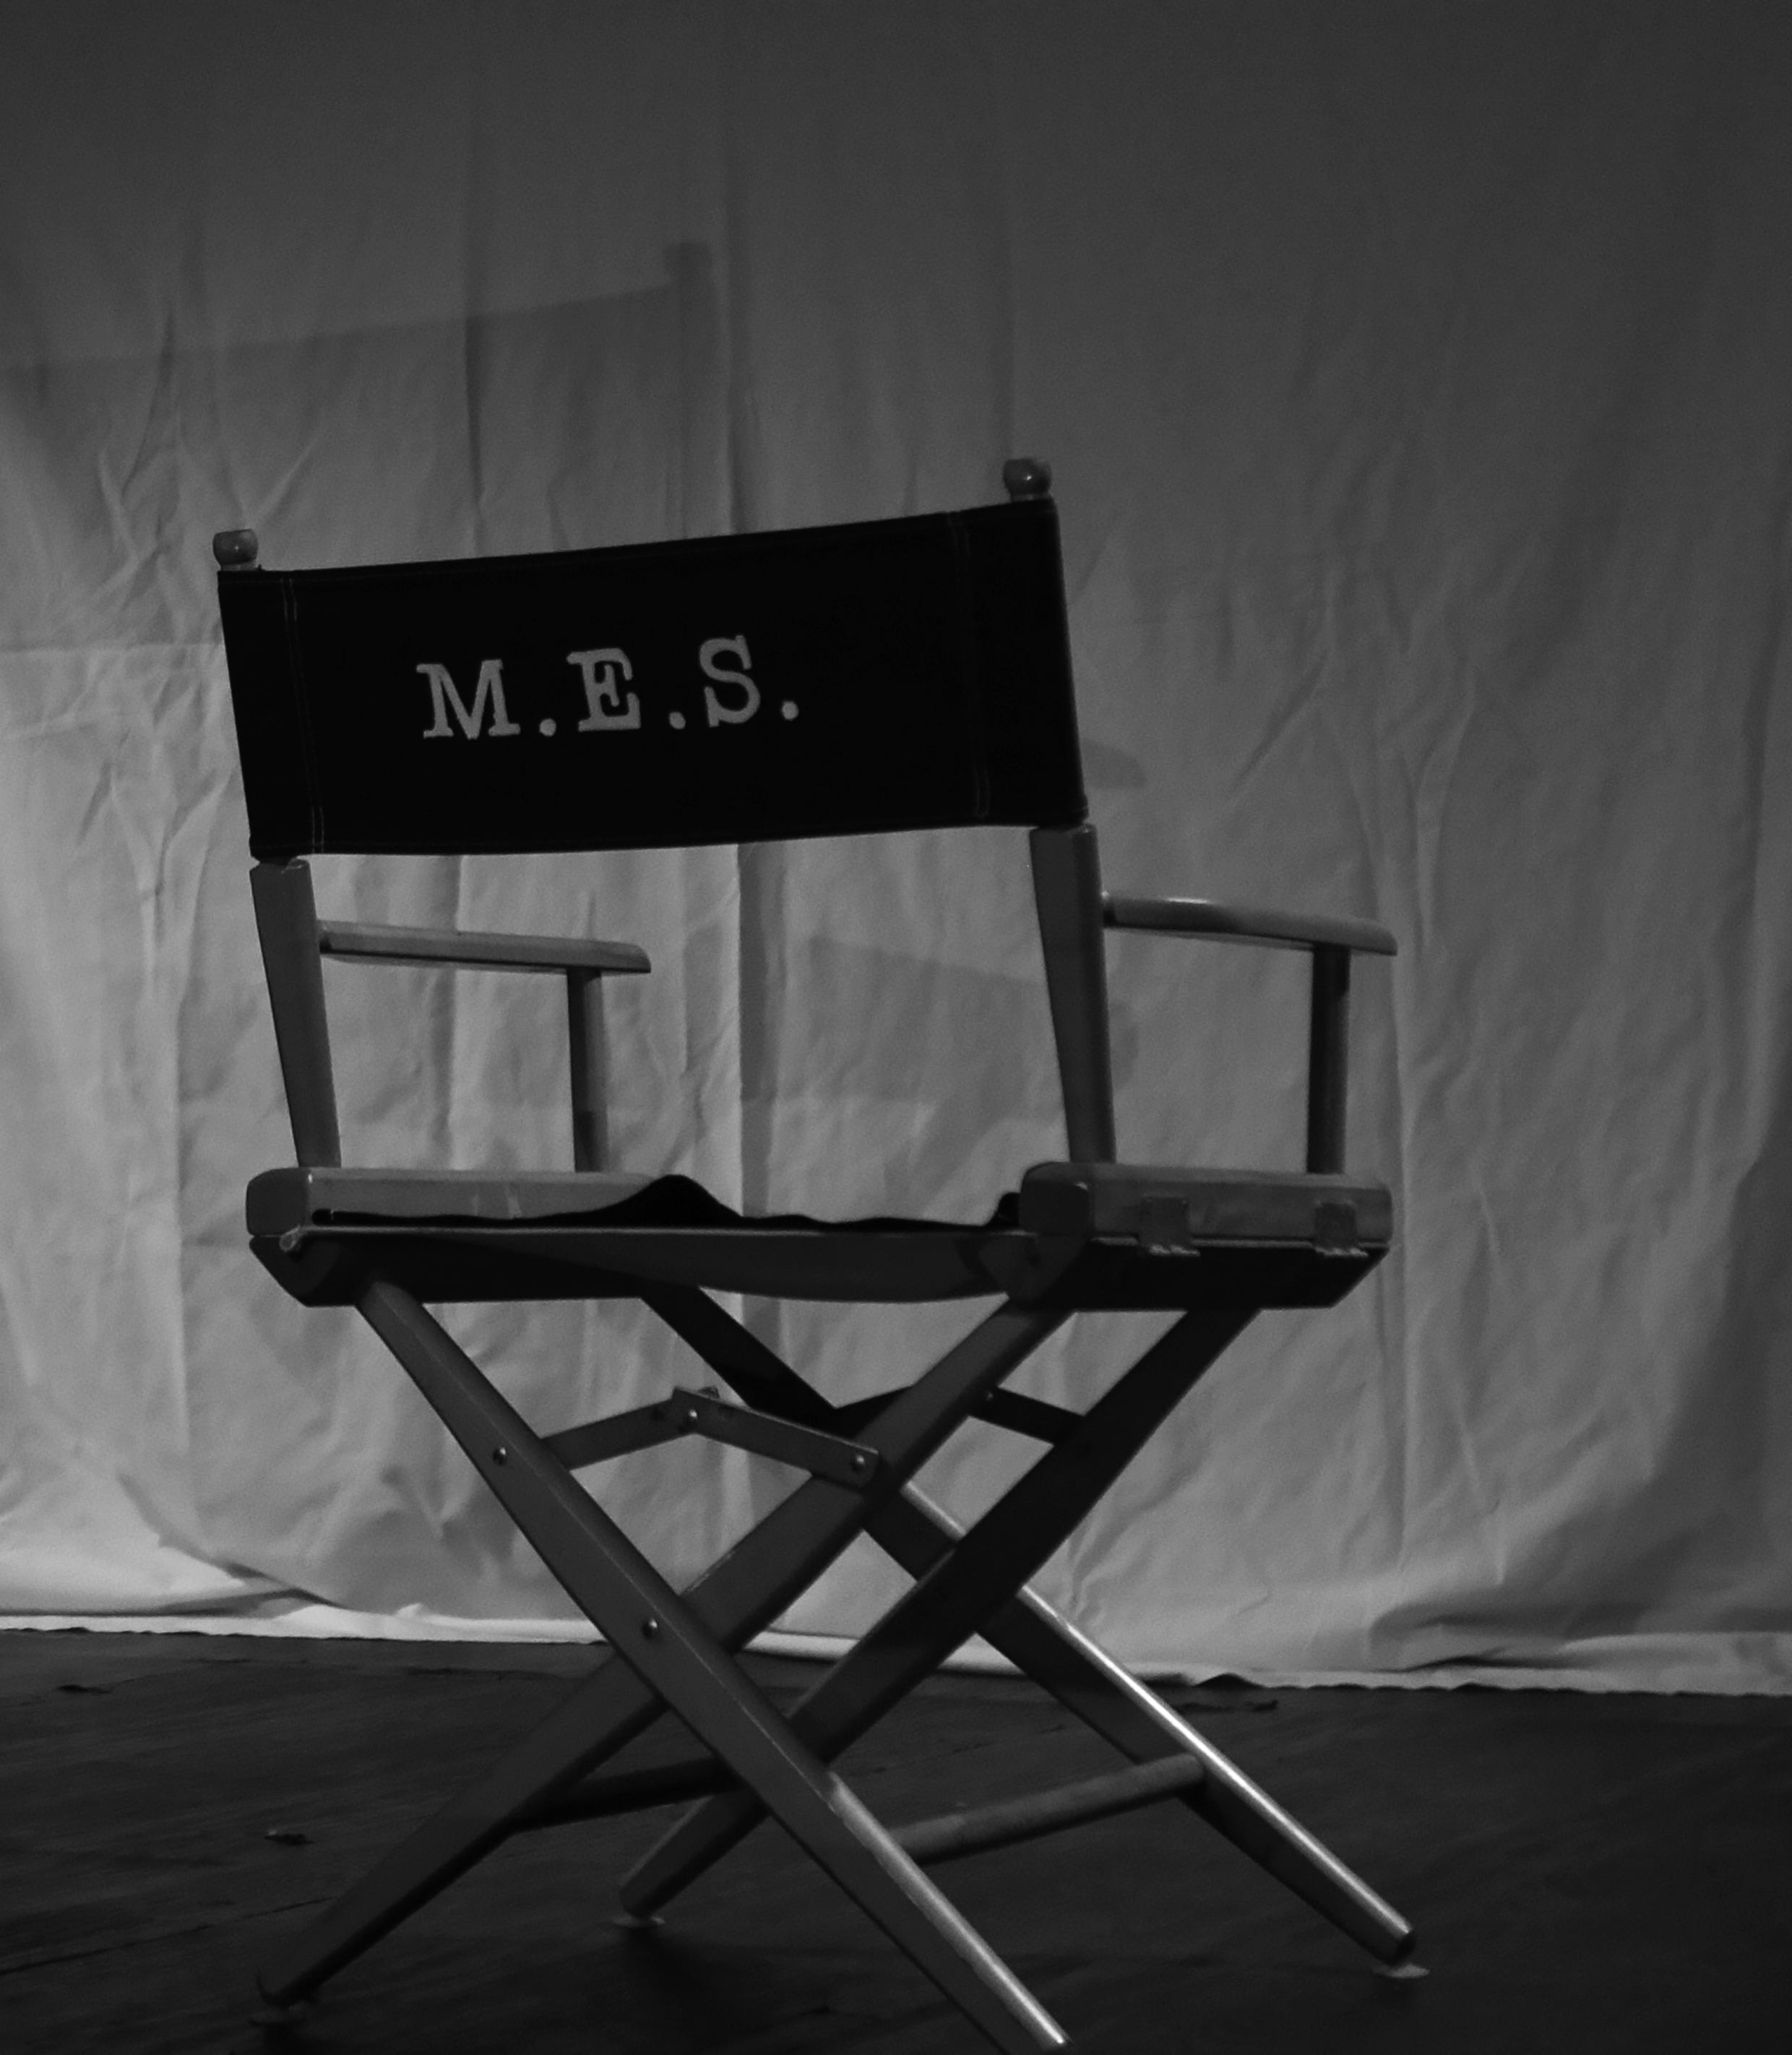 fauteuil_mes-1528135066.jpg